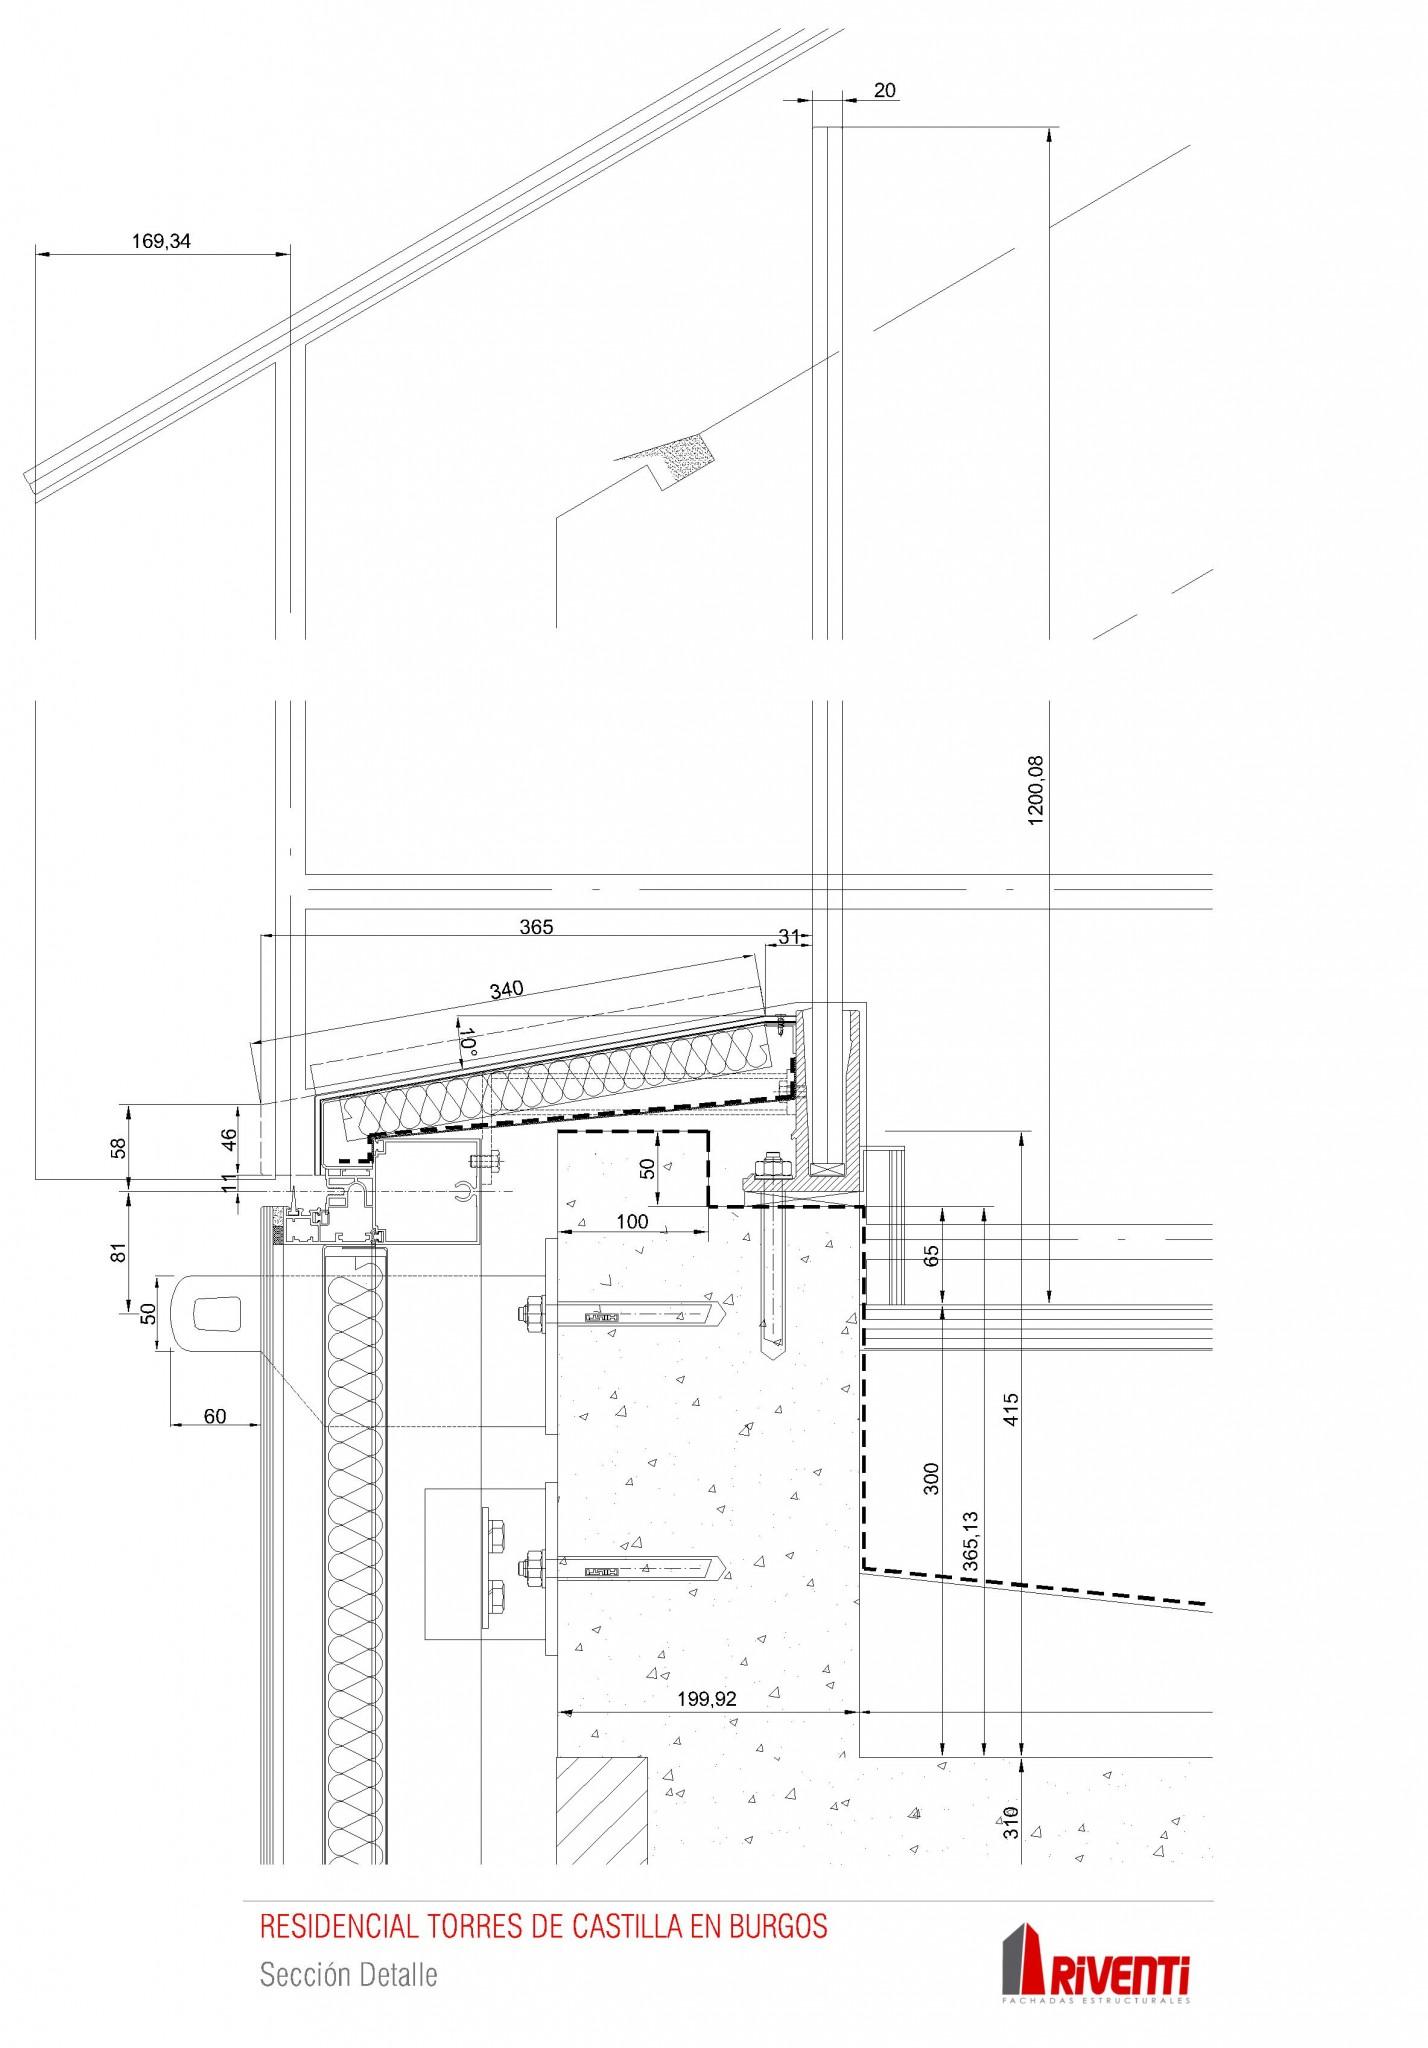 FACHADA-TORRES DE CASTILLA-DETALLES CONSTRUCTIVOS-RIVENTI (3)